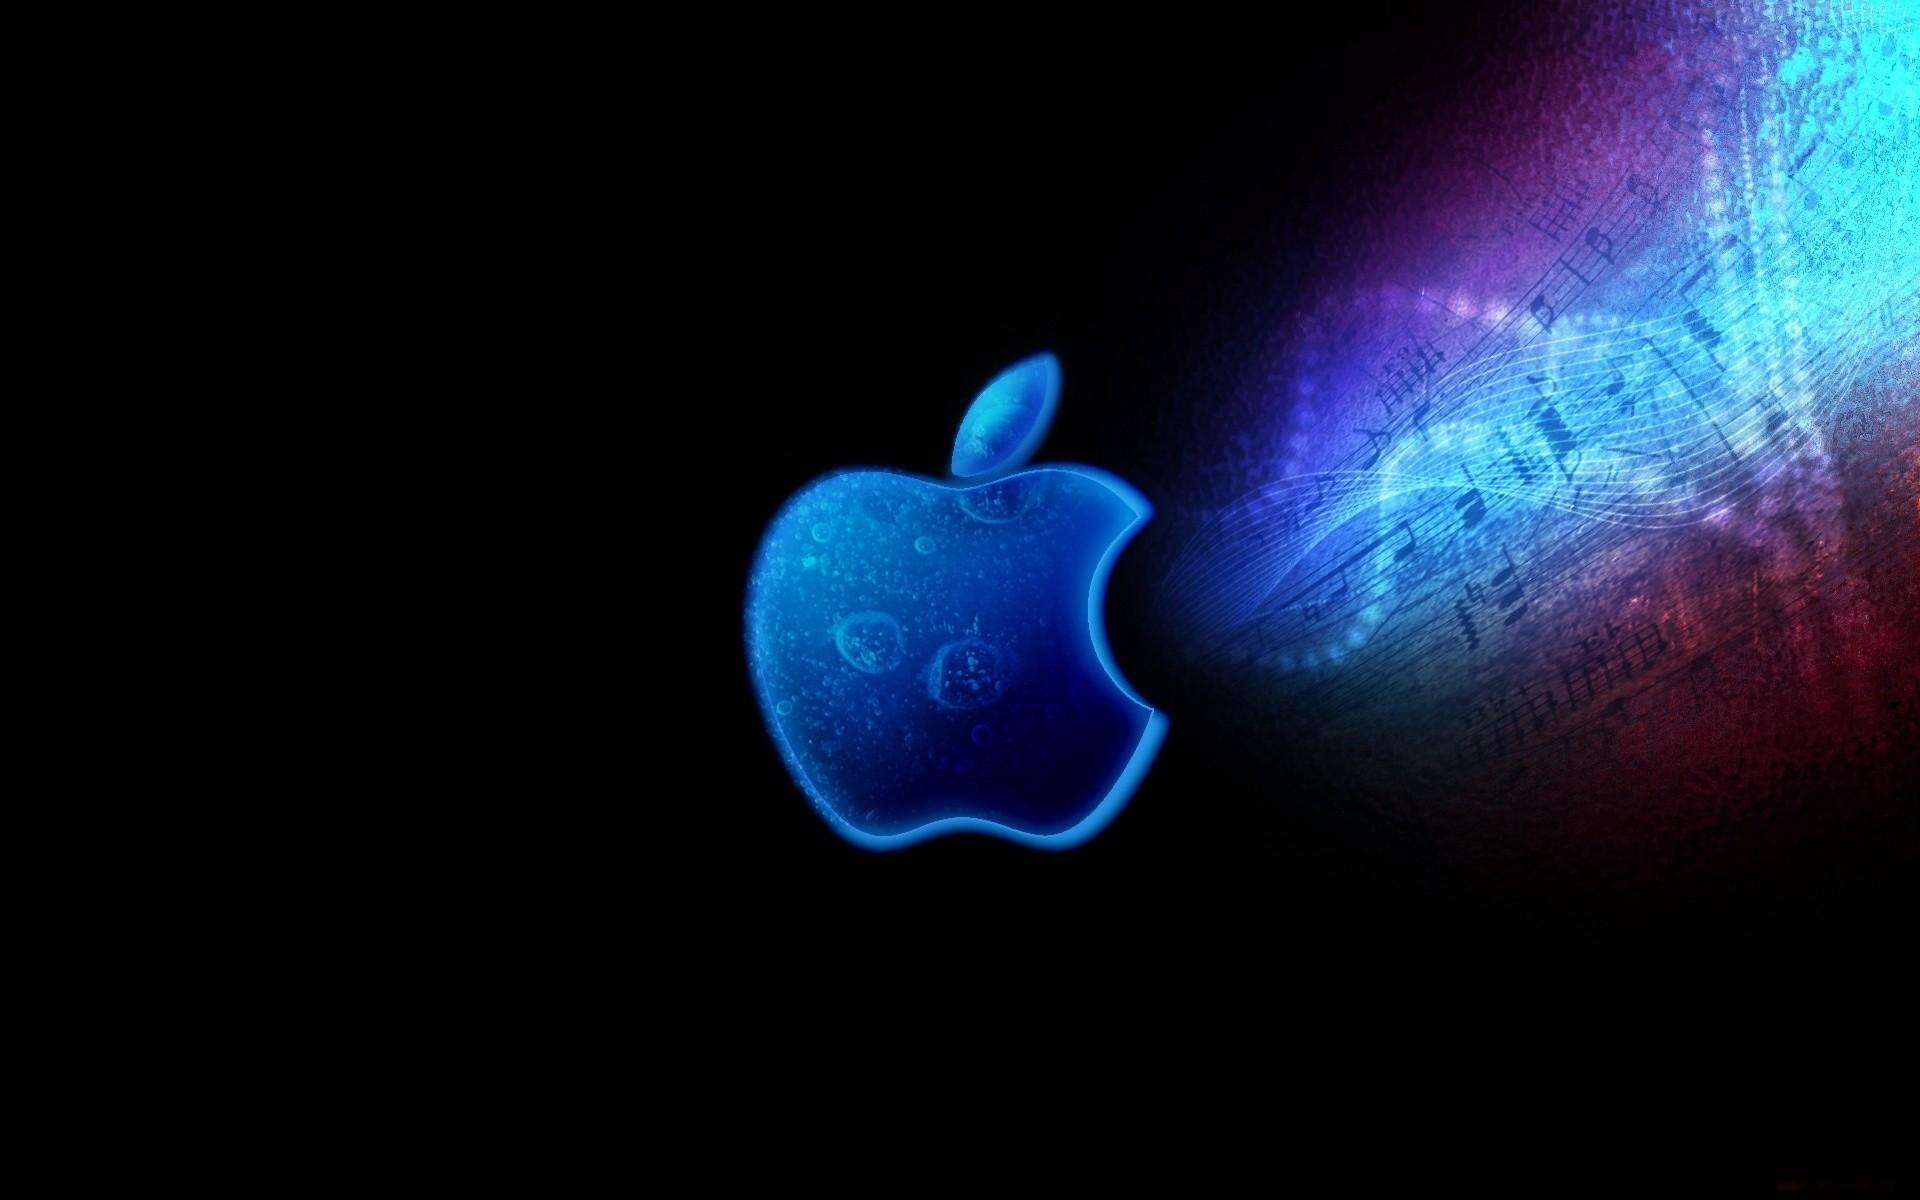 Wallpaper apple, mac, brand, logo, neon, light, bright,